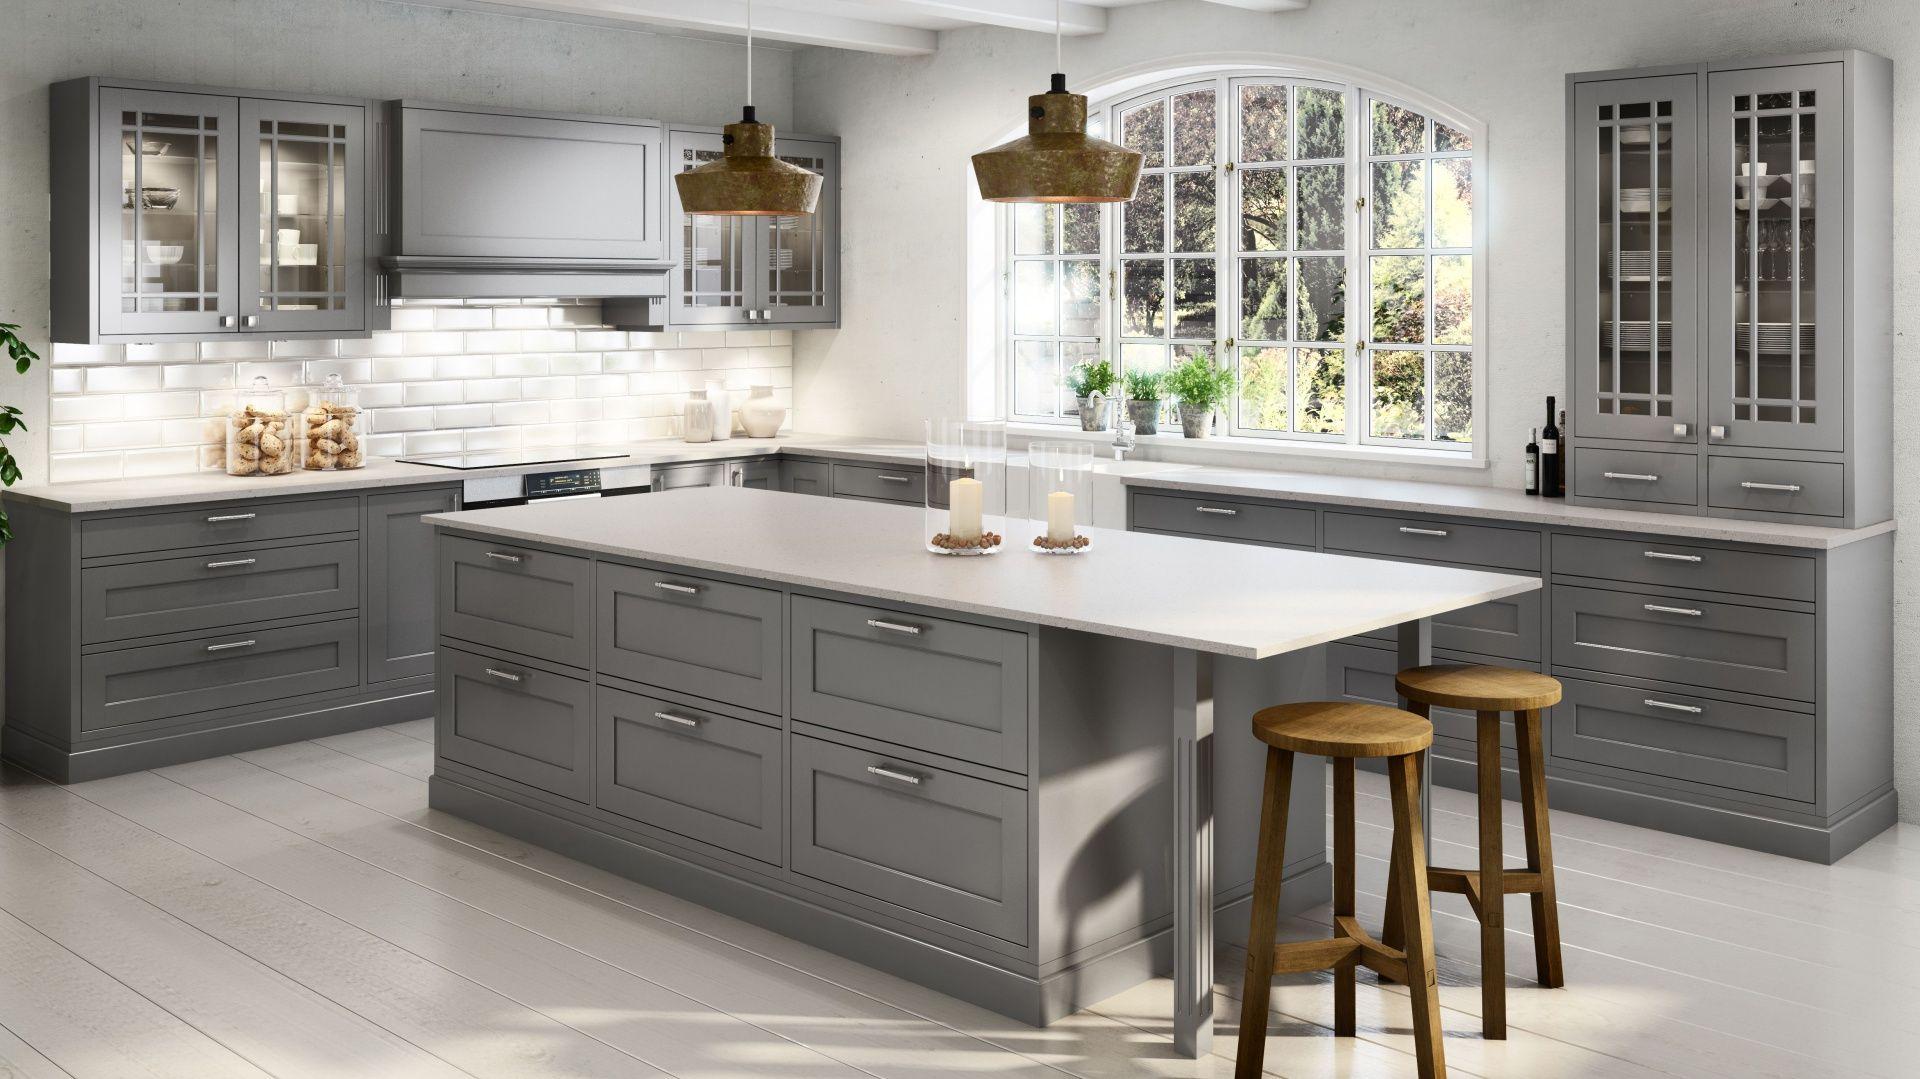 Modna Kuchnia Postaw Na Meble W Szarym Kolorze Kitchen Design Luxury Kitchen Design Islands Kitchen Decor